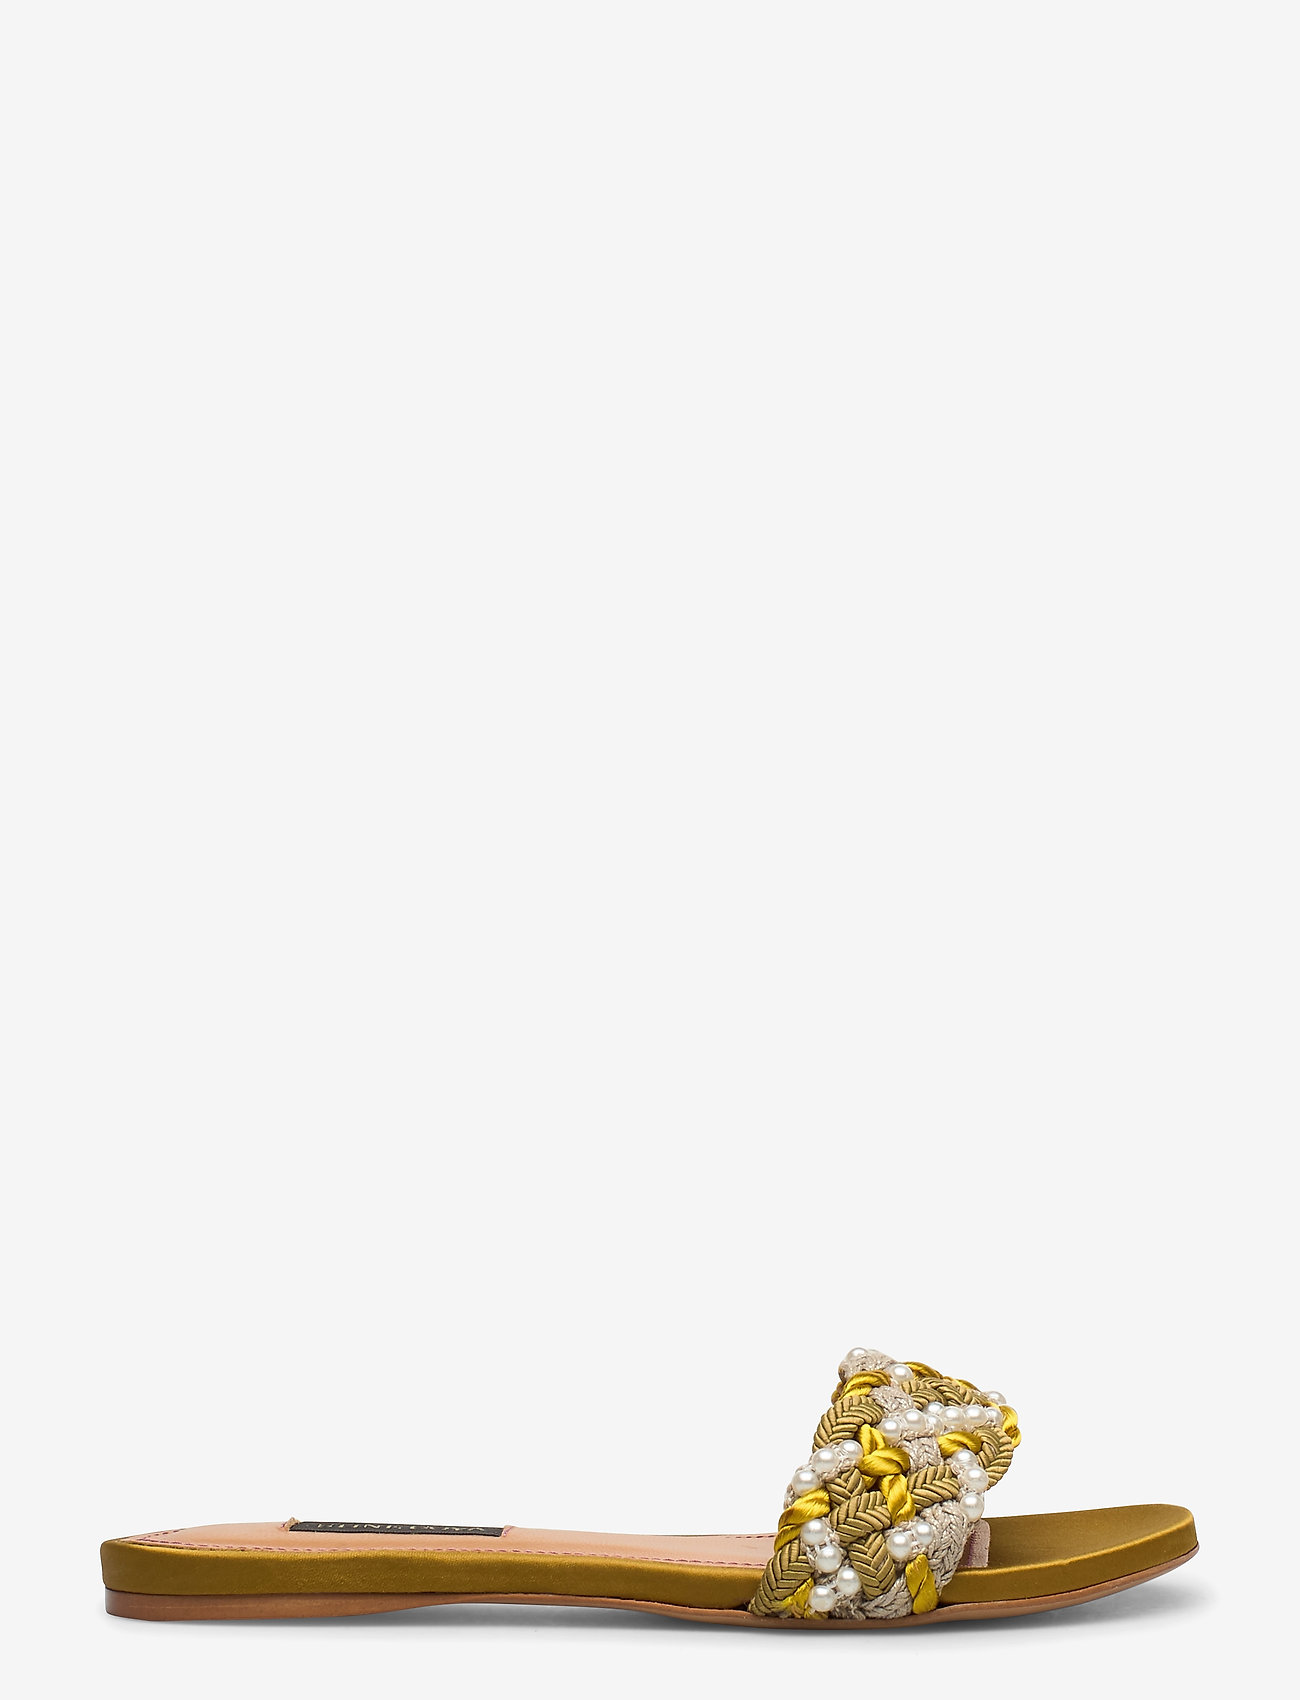 STINE GOYA - Alaia, 888 Alaia Sandal - matalat sandaalit - gold - 1